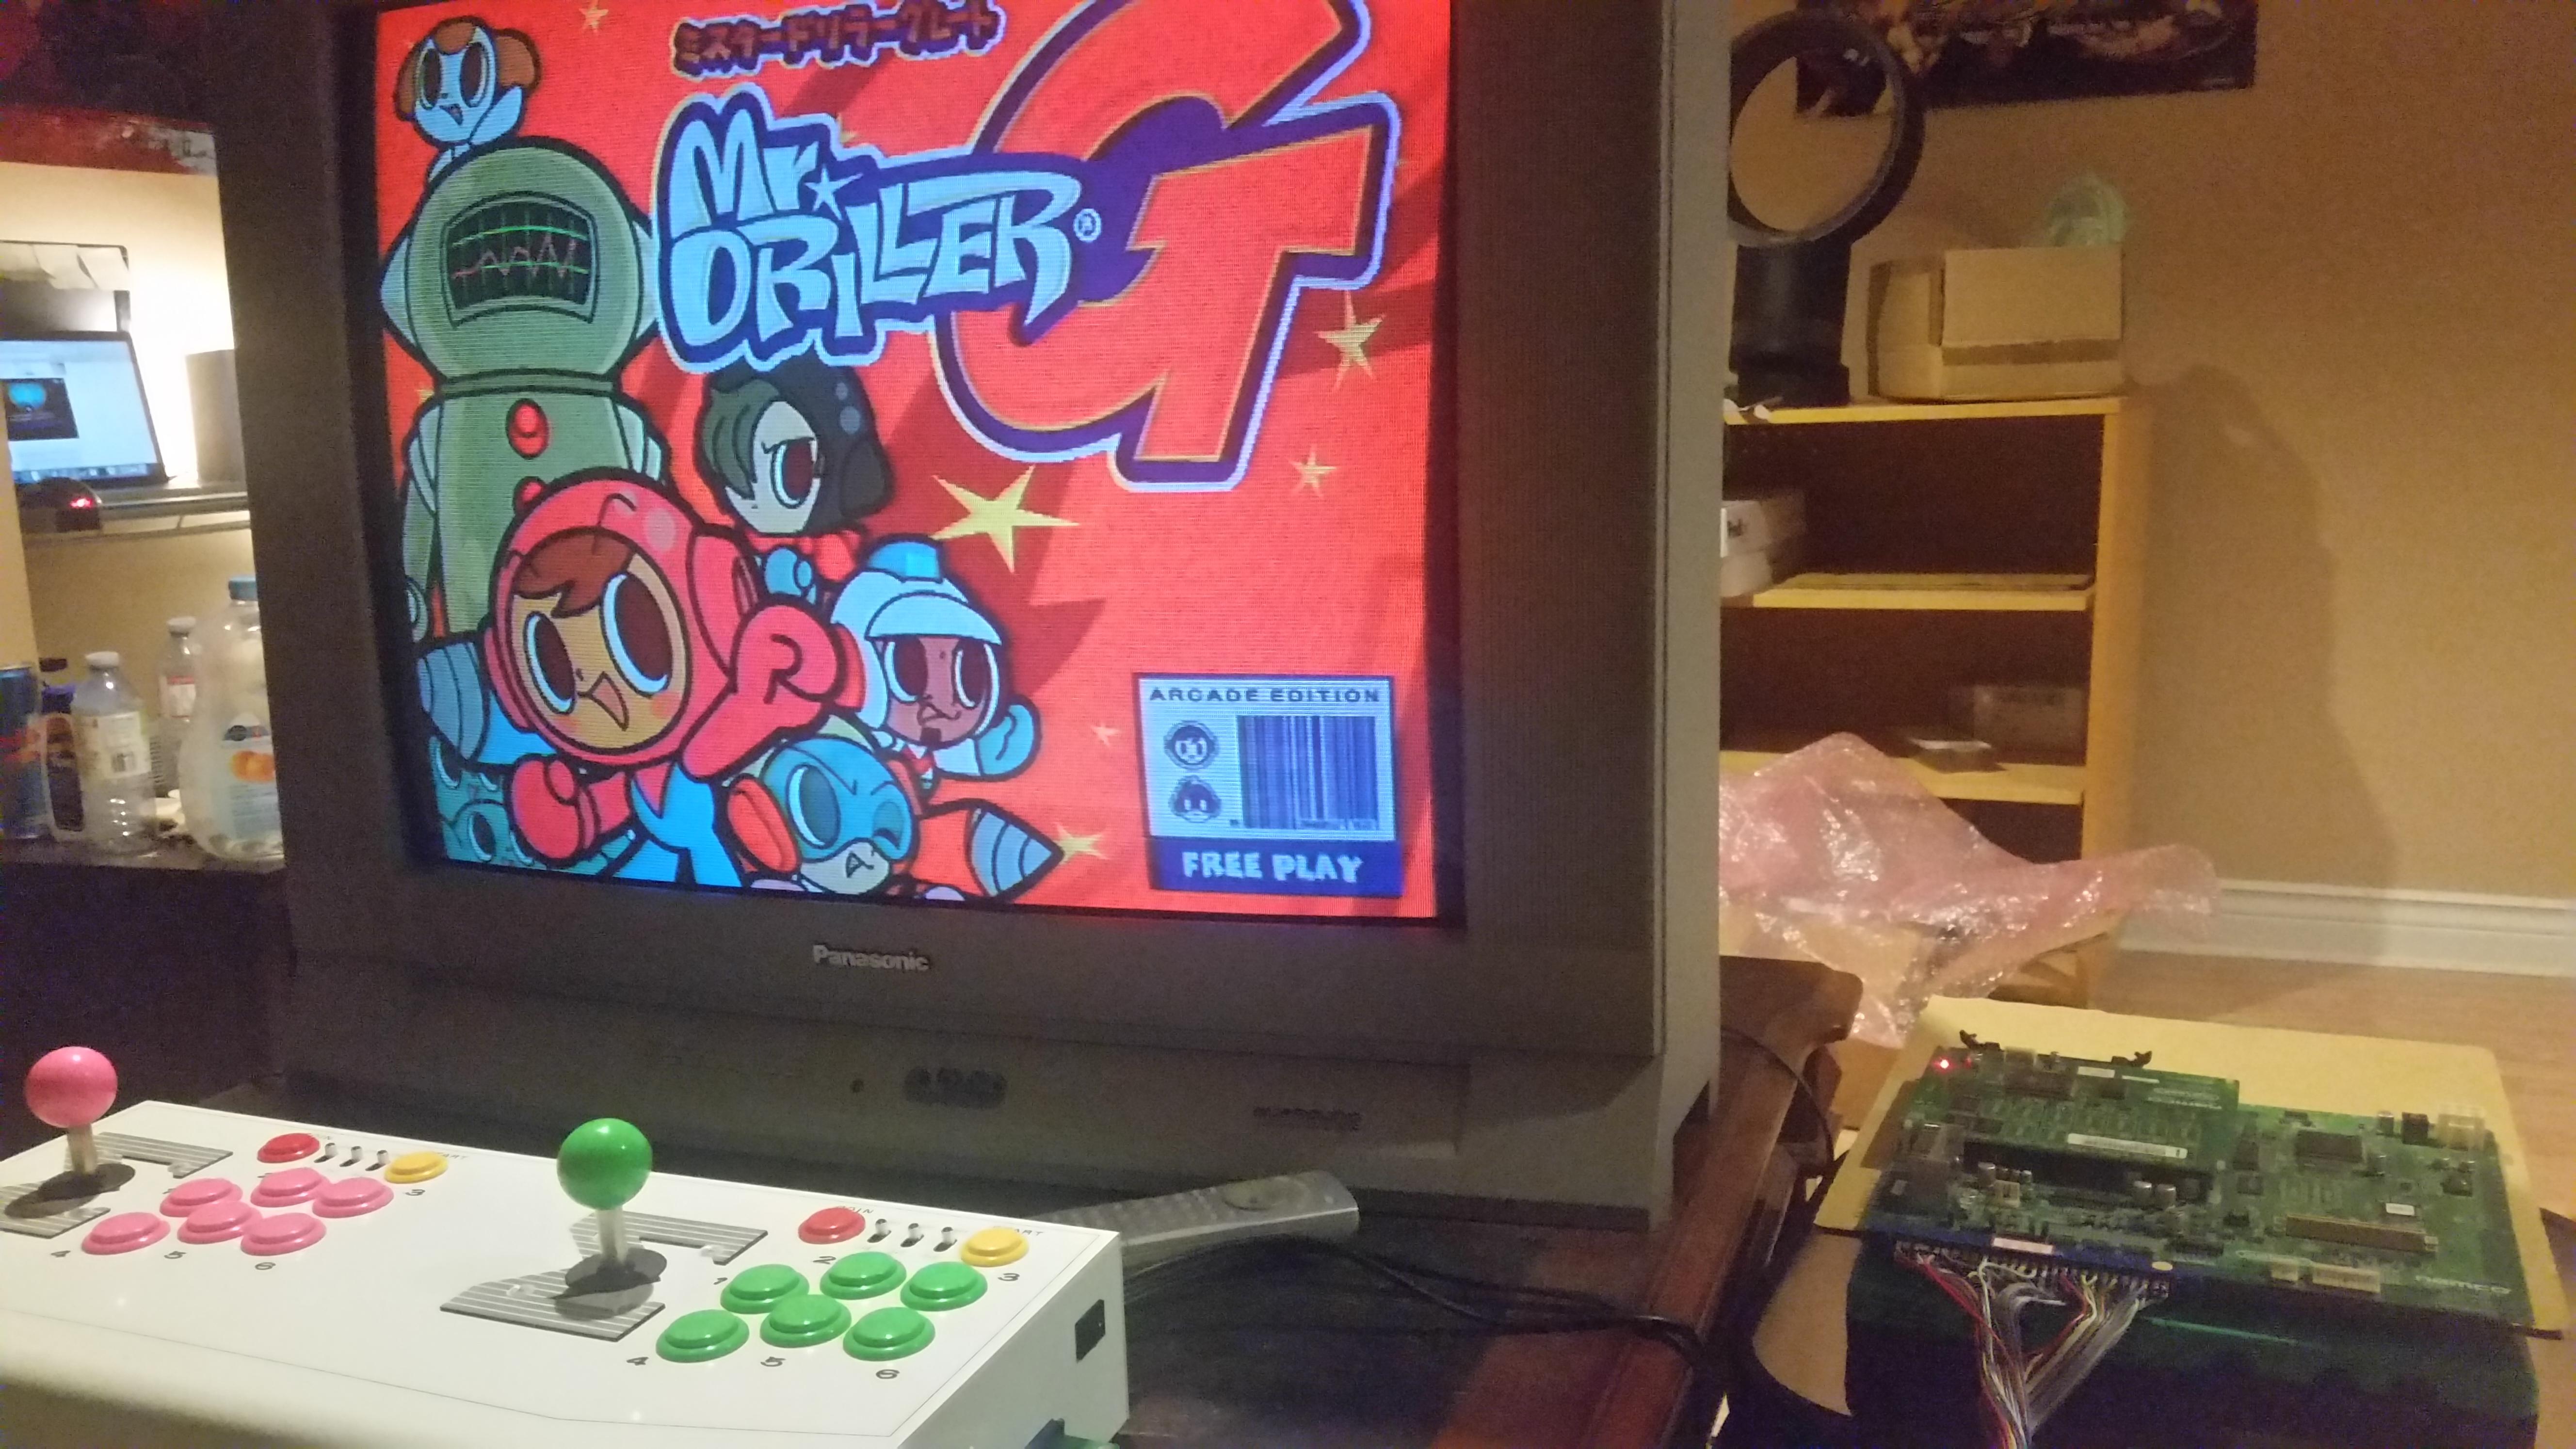 ScoobertDoobert: Mr. Driller G (Arcade) 2,000,275 points on 2017-09-07 16:18:14